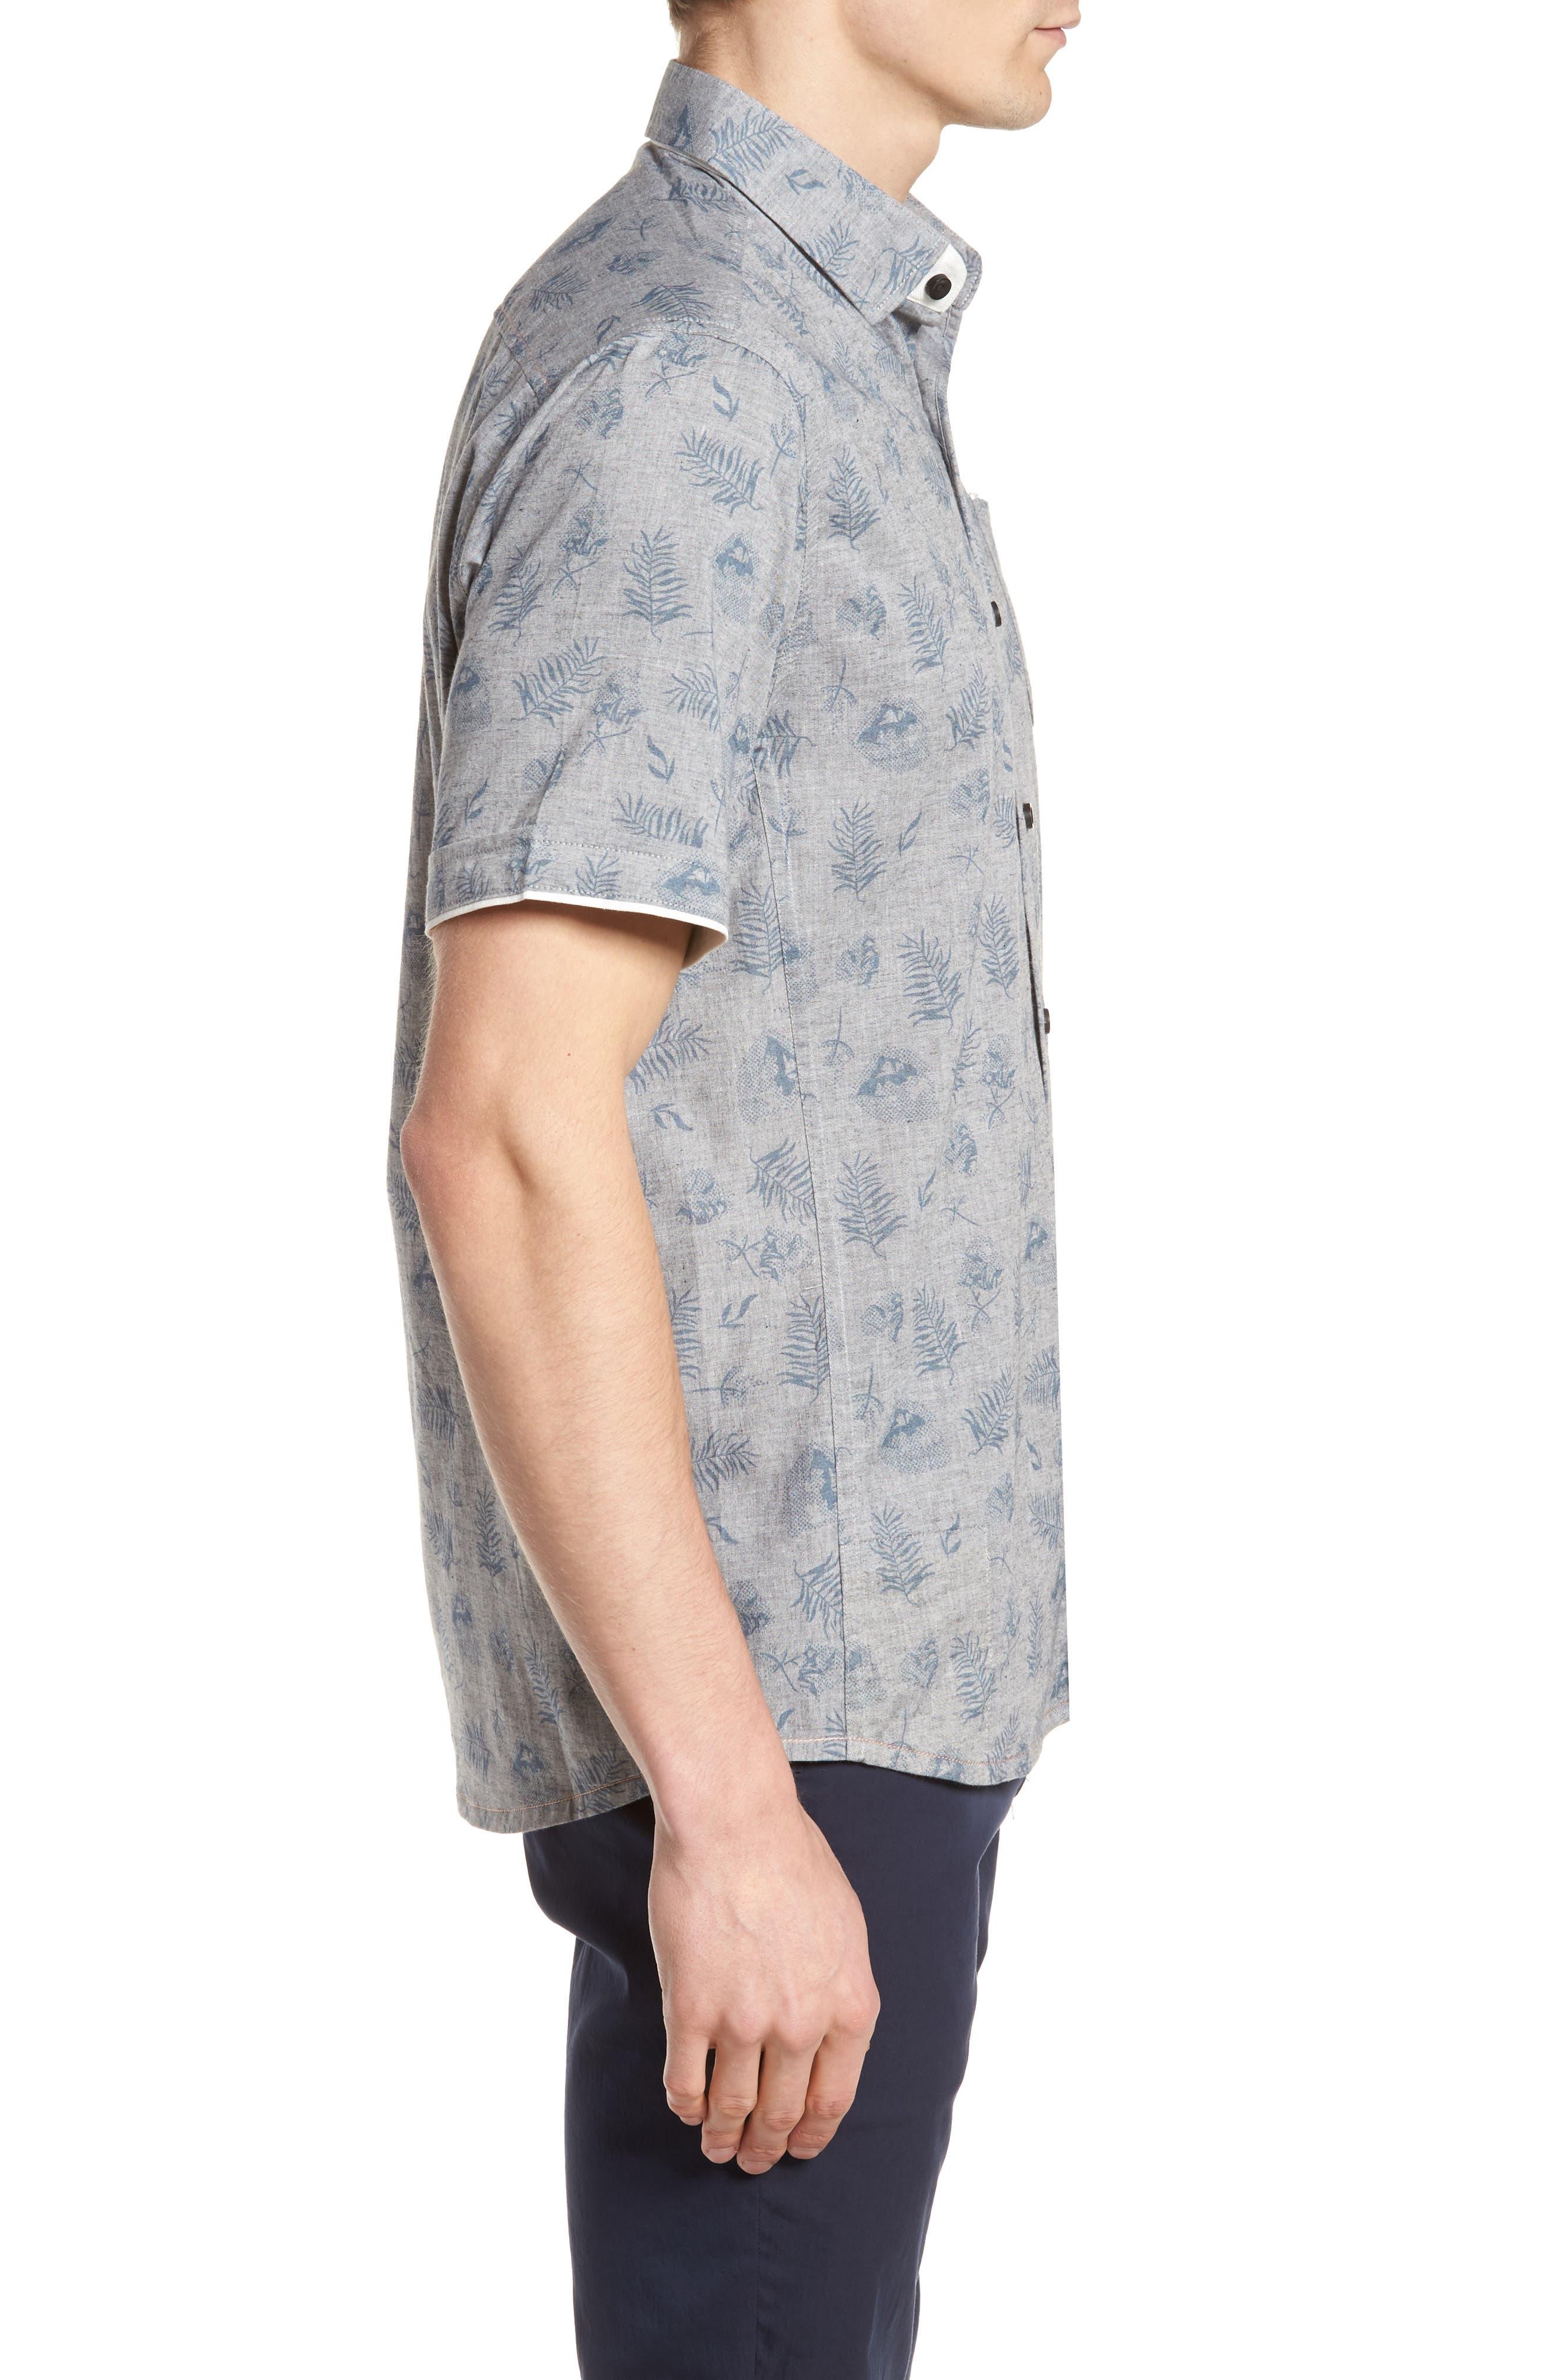 Rock Steady Woven Shirt,                             Alternate thumbnail 3, color,                             GREY